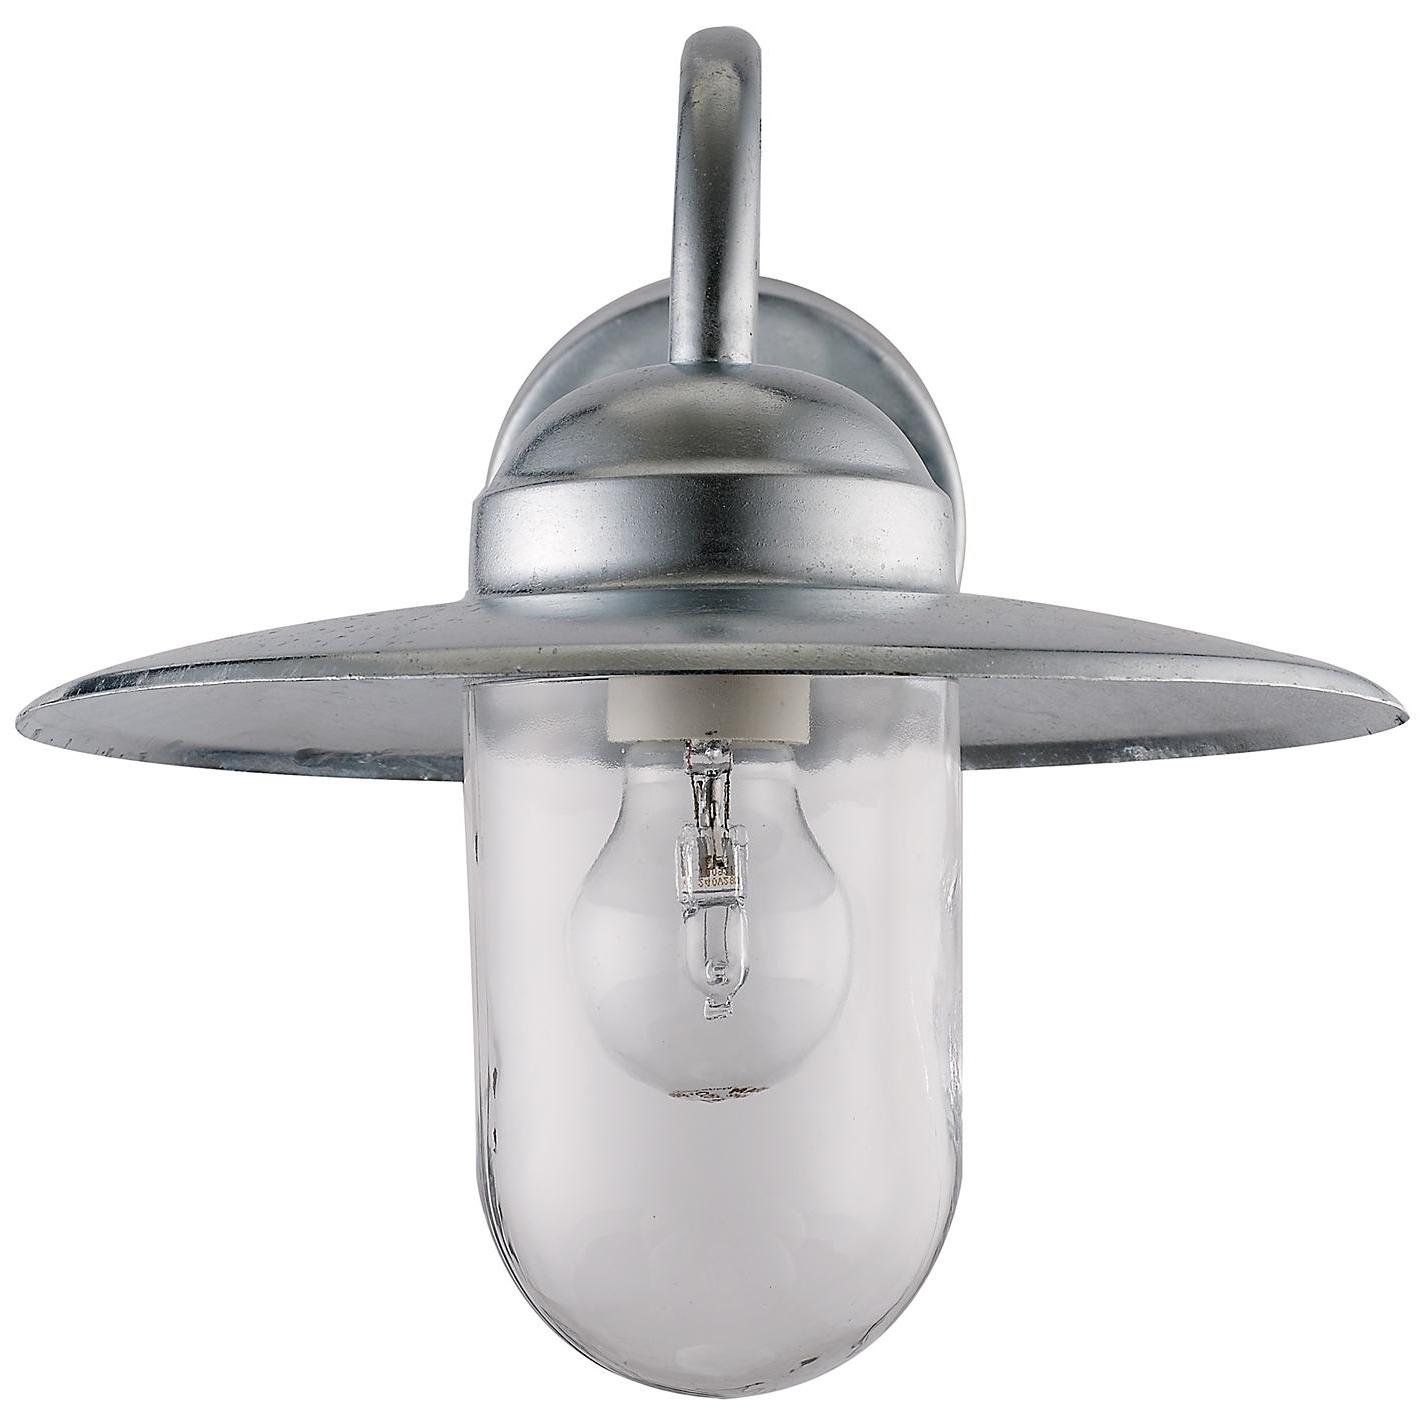 Pir Sensor Outdoor Wall Lighting Pertaining To Preferred Outdoor Pir Lighting Sensors • Outdoor Lighting (View 11 of 20)